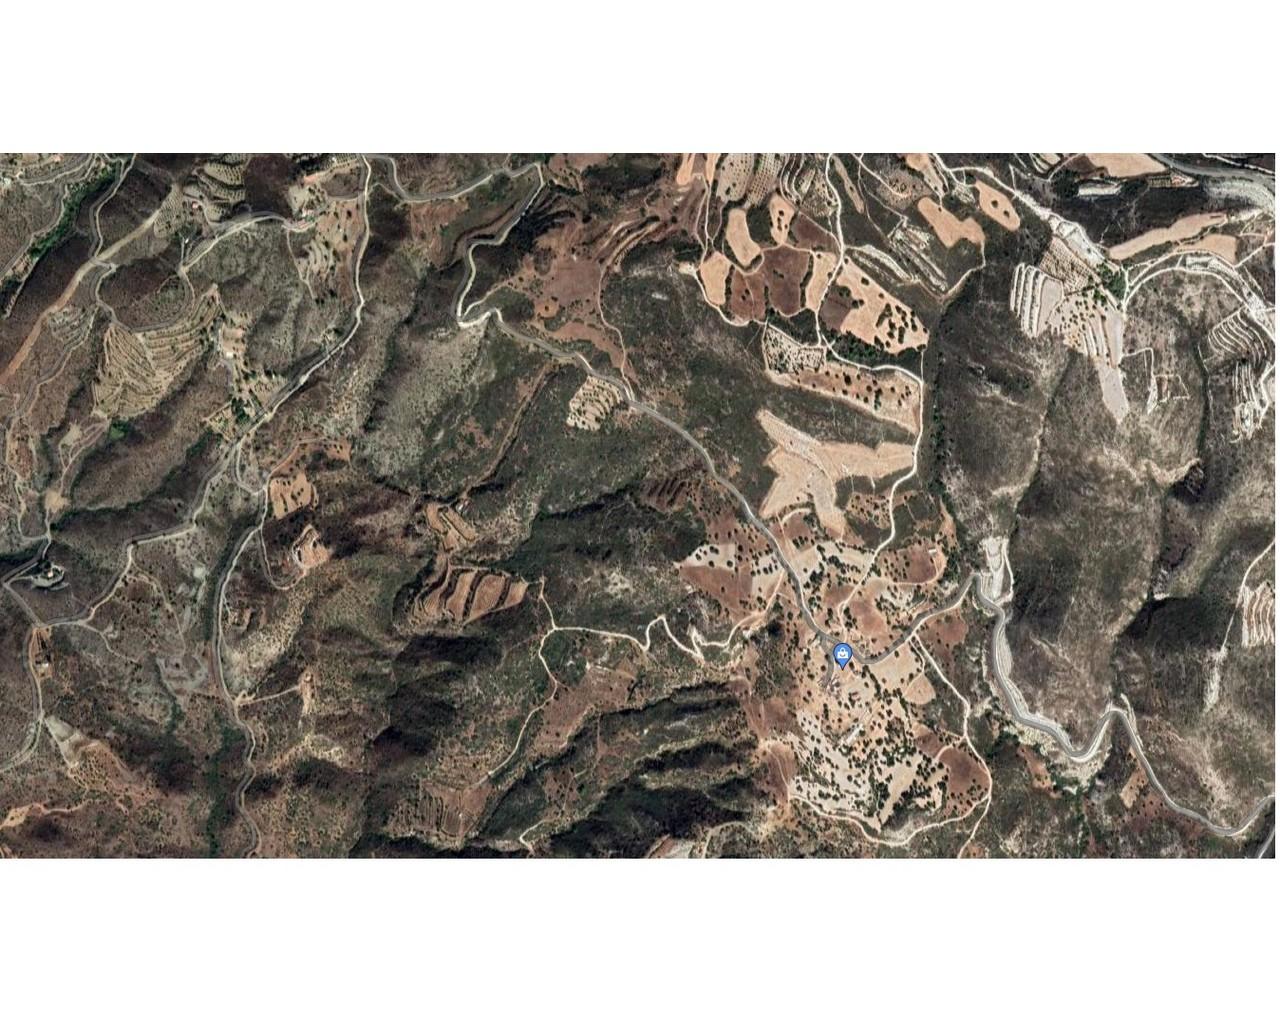 Land Larnaca(Ora)  595 SqMt for sale